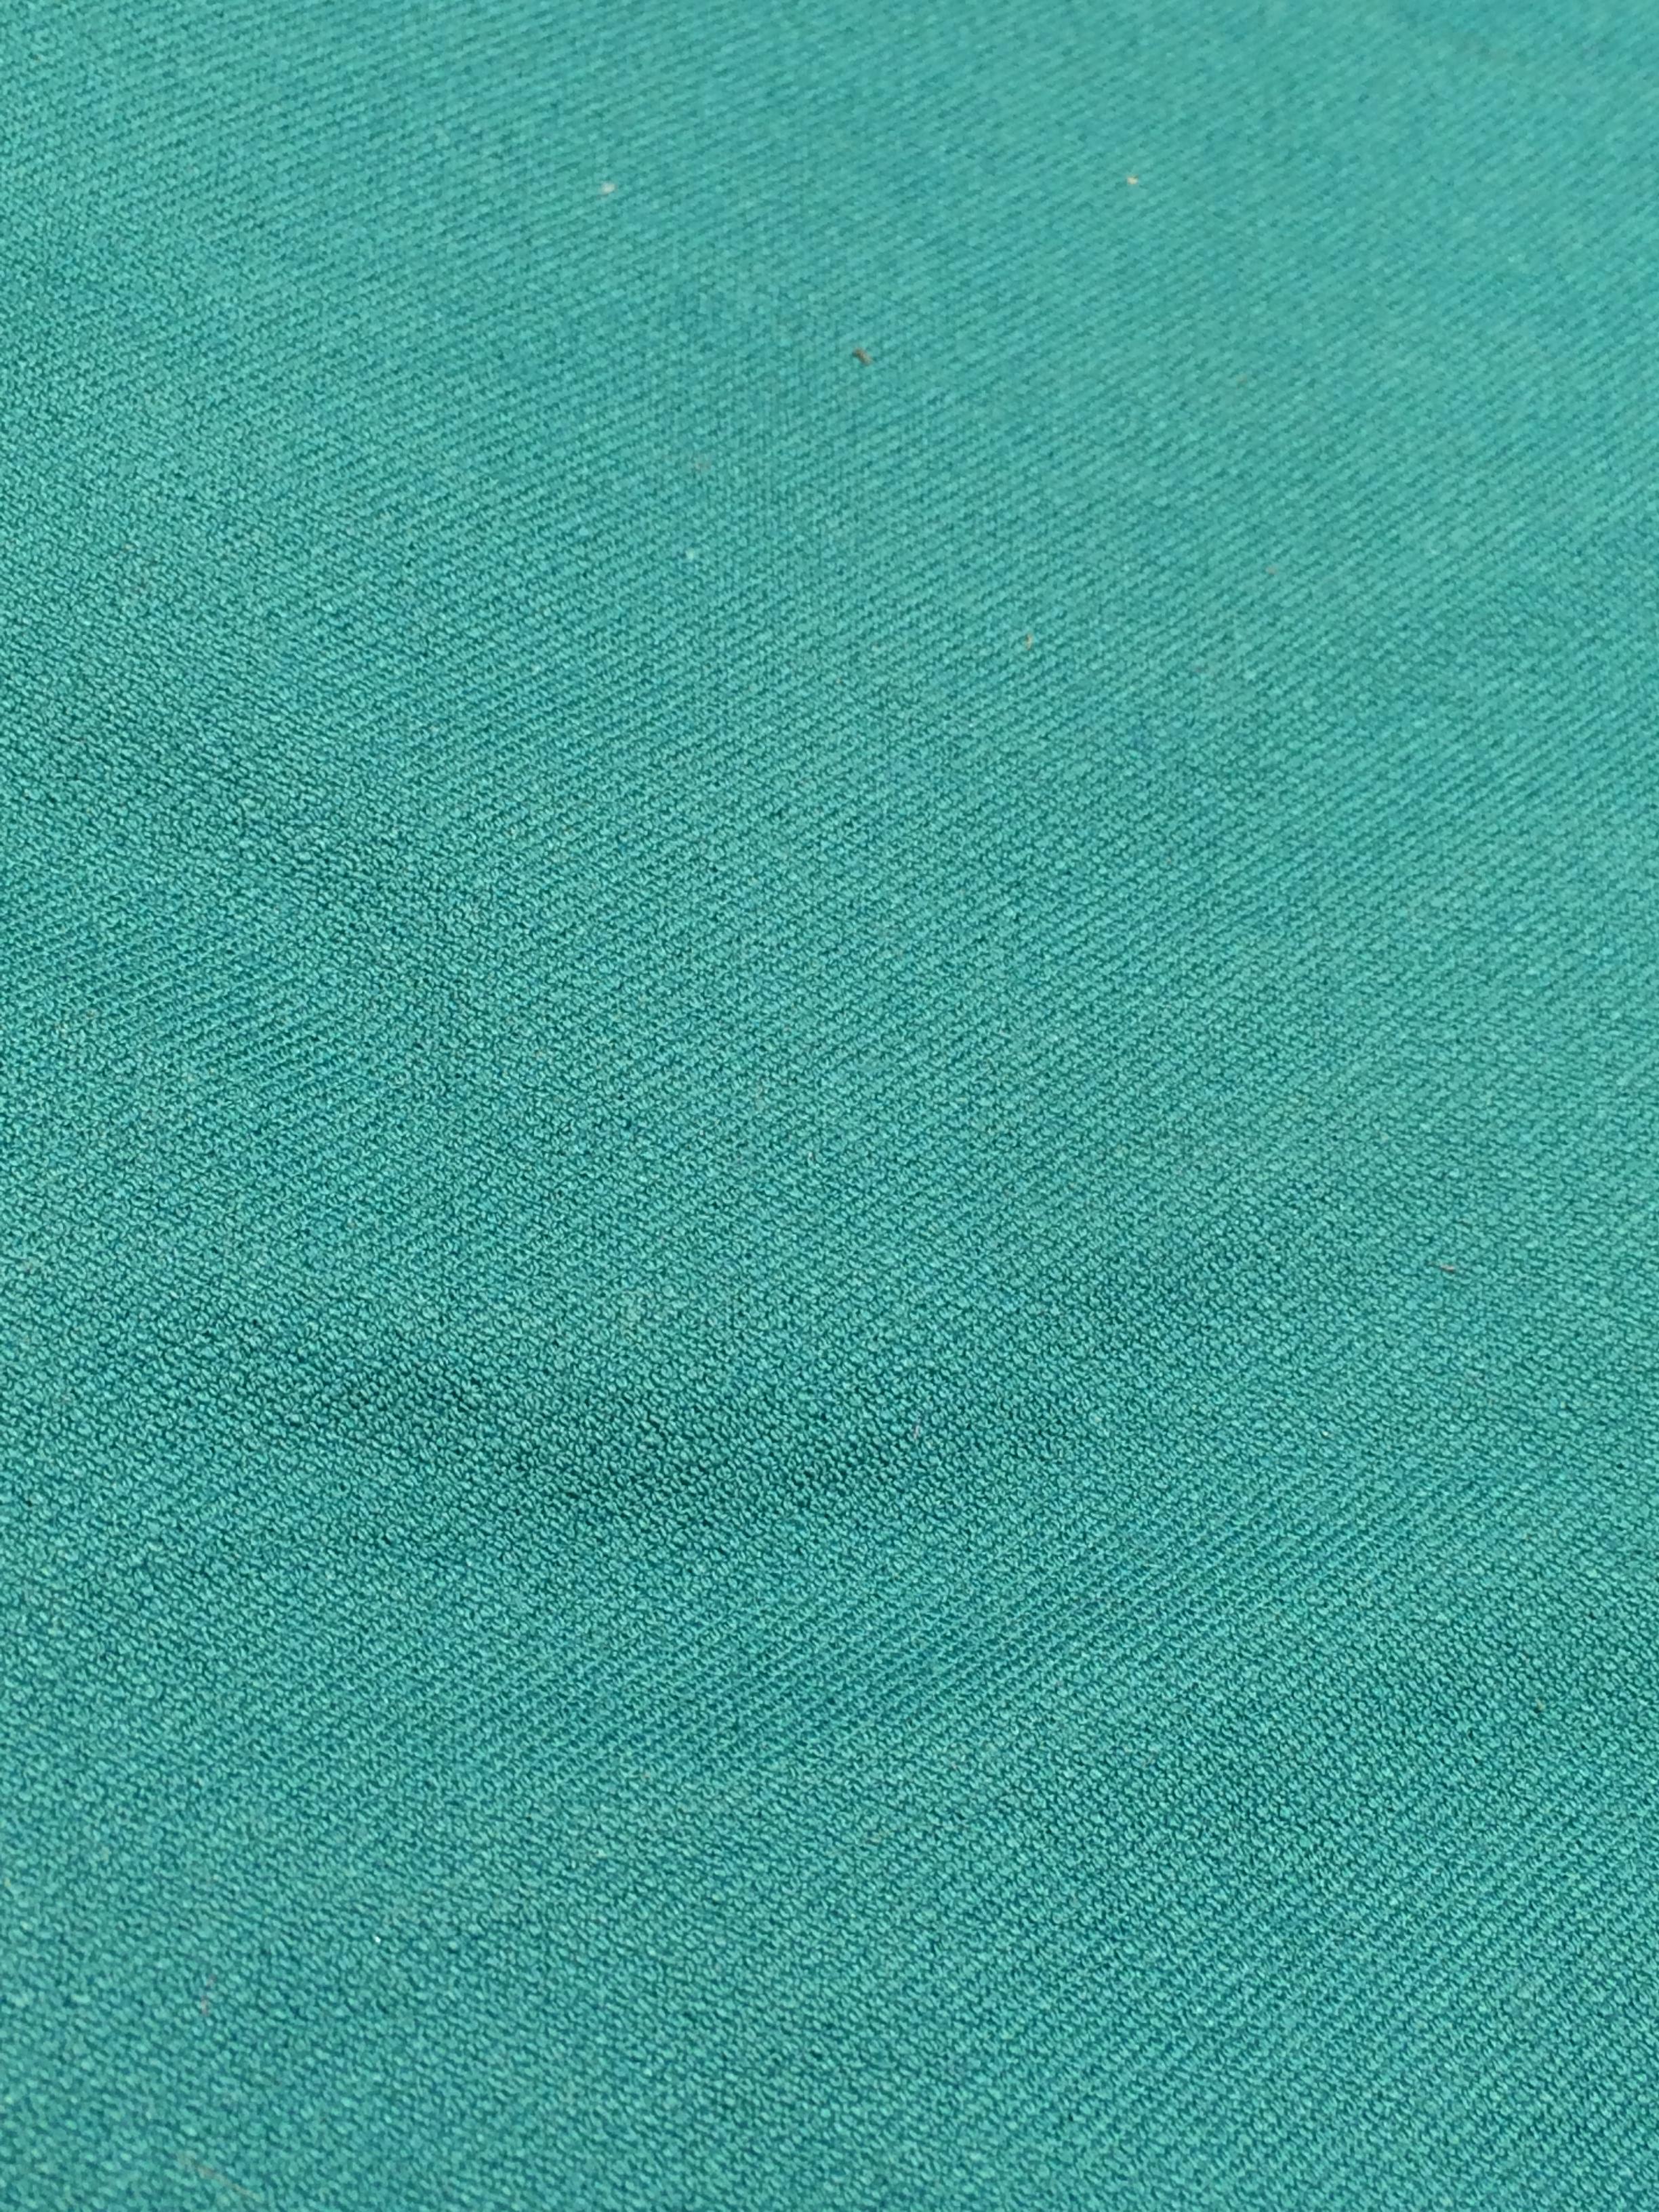 turquoise cotton with elastane